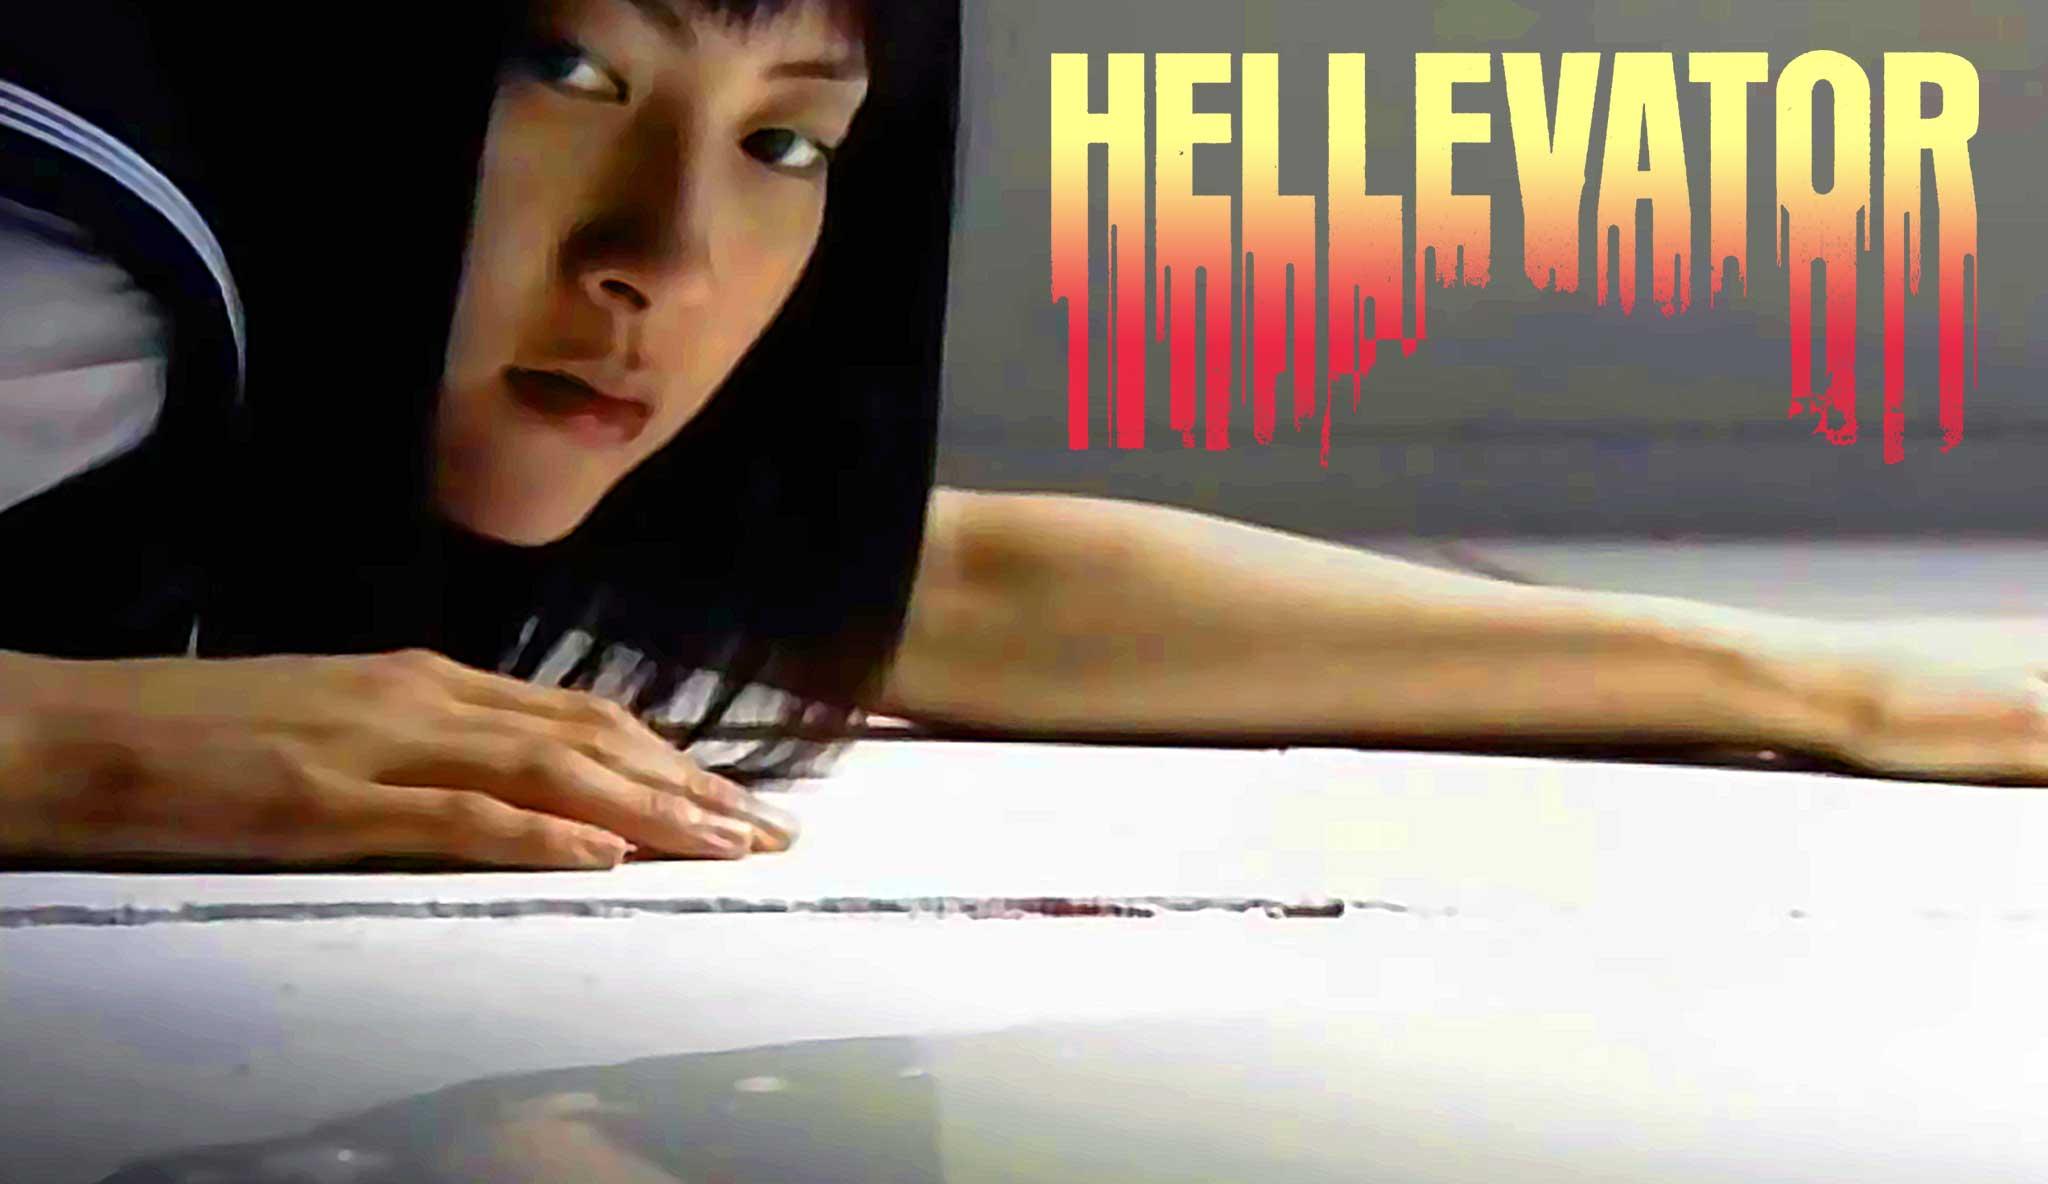 hellevator-gusha-no-bindume\header.jpg